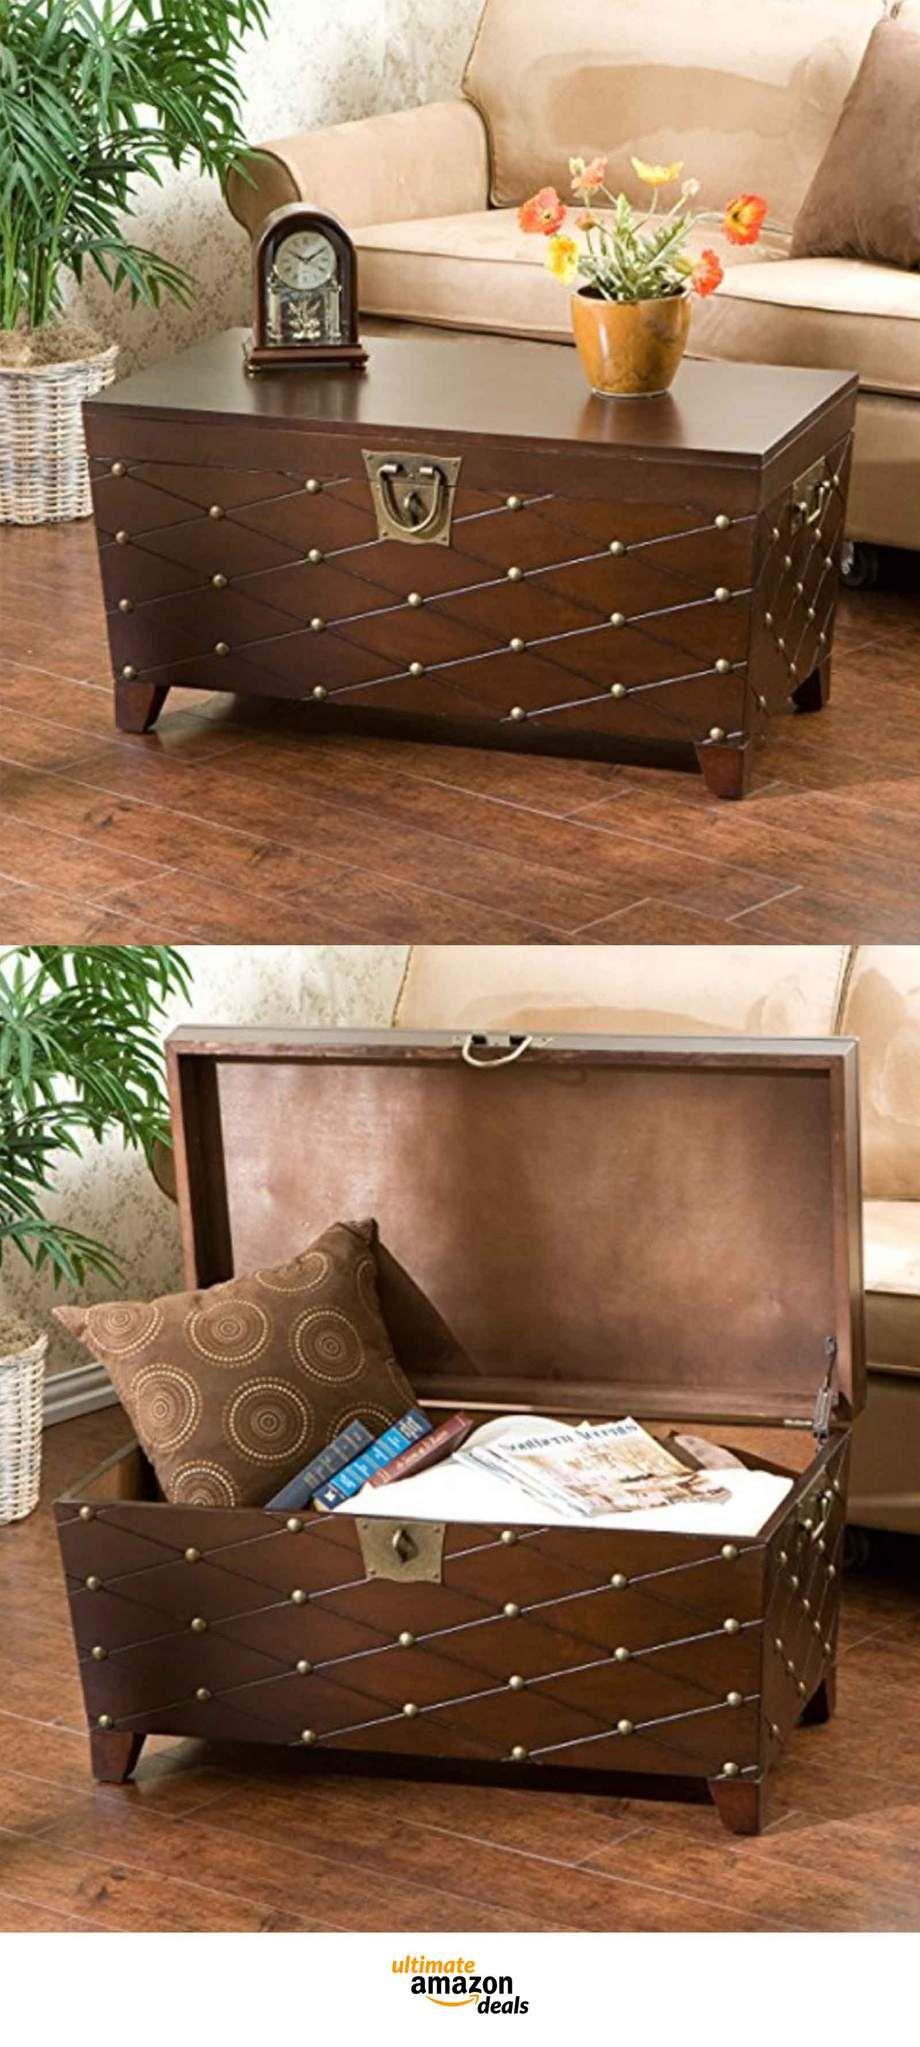 13 Unique Storage Trunks For Stylish Organization On Amazon Now Amazon Home Decor Unique Storage Stylish Organizing #storage #trunks #living #room